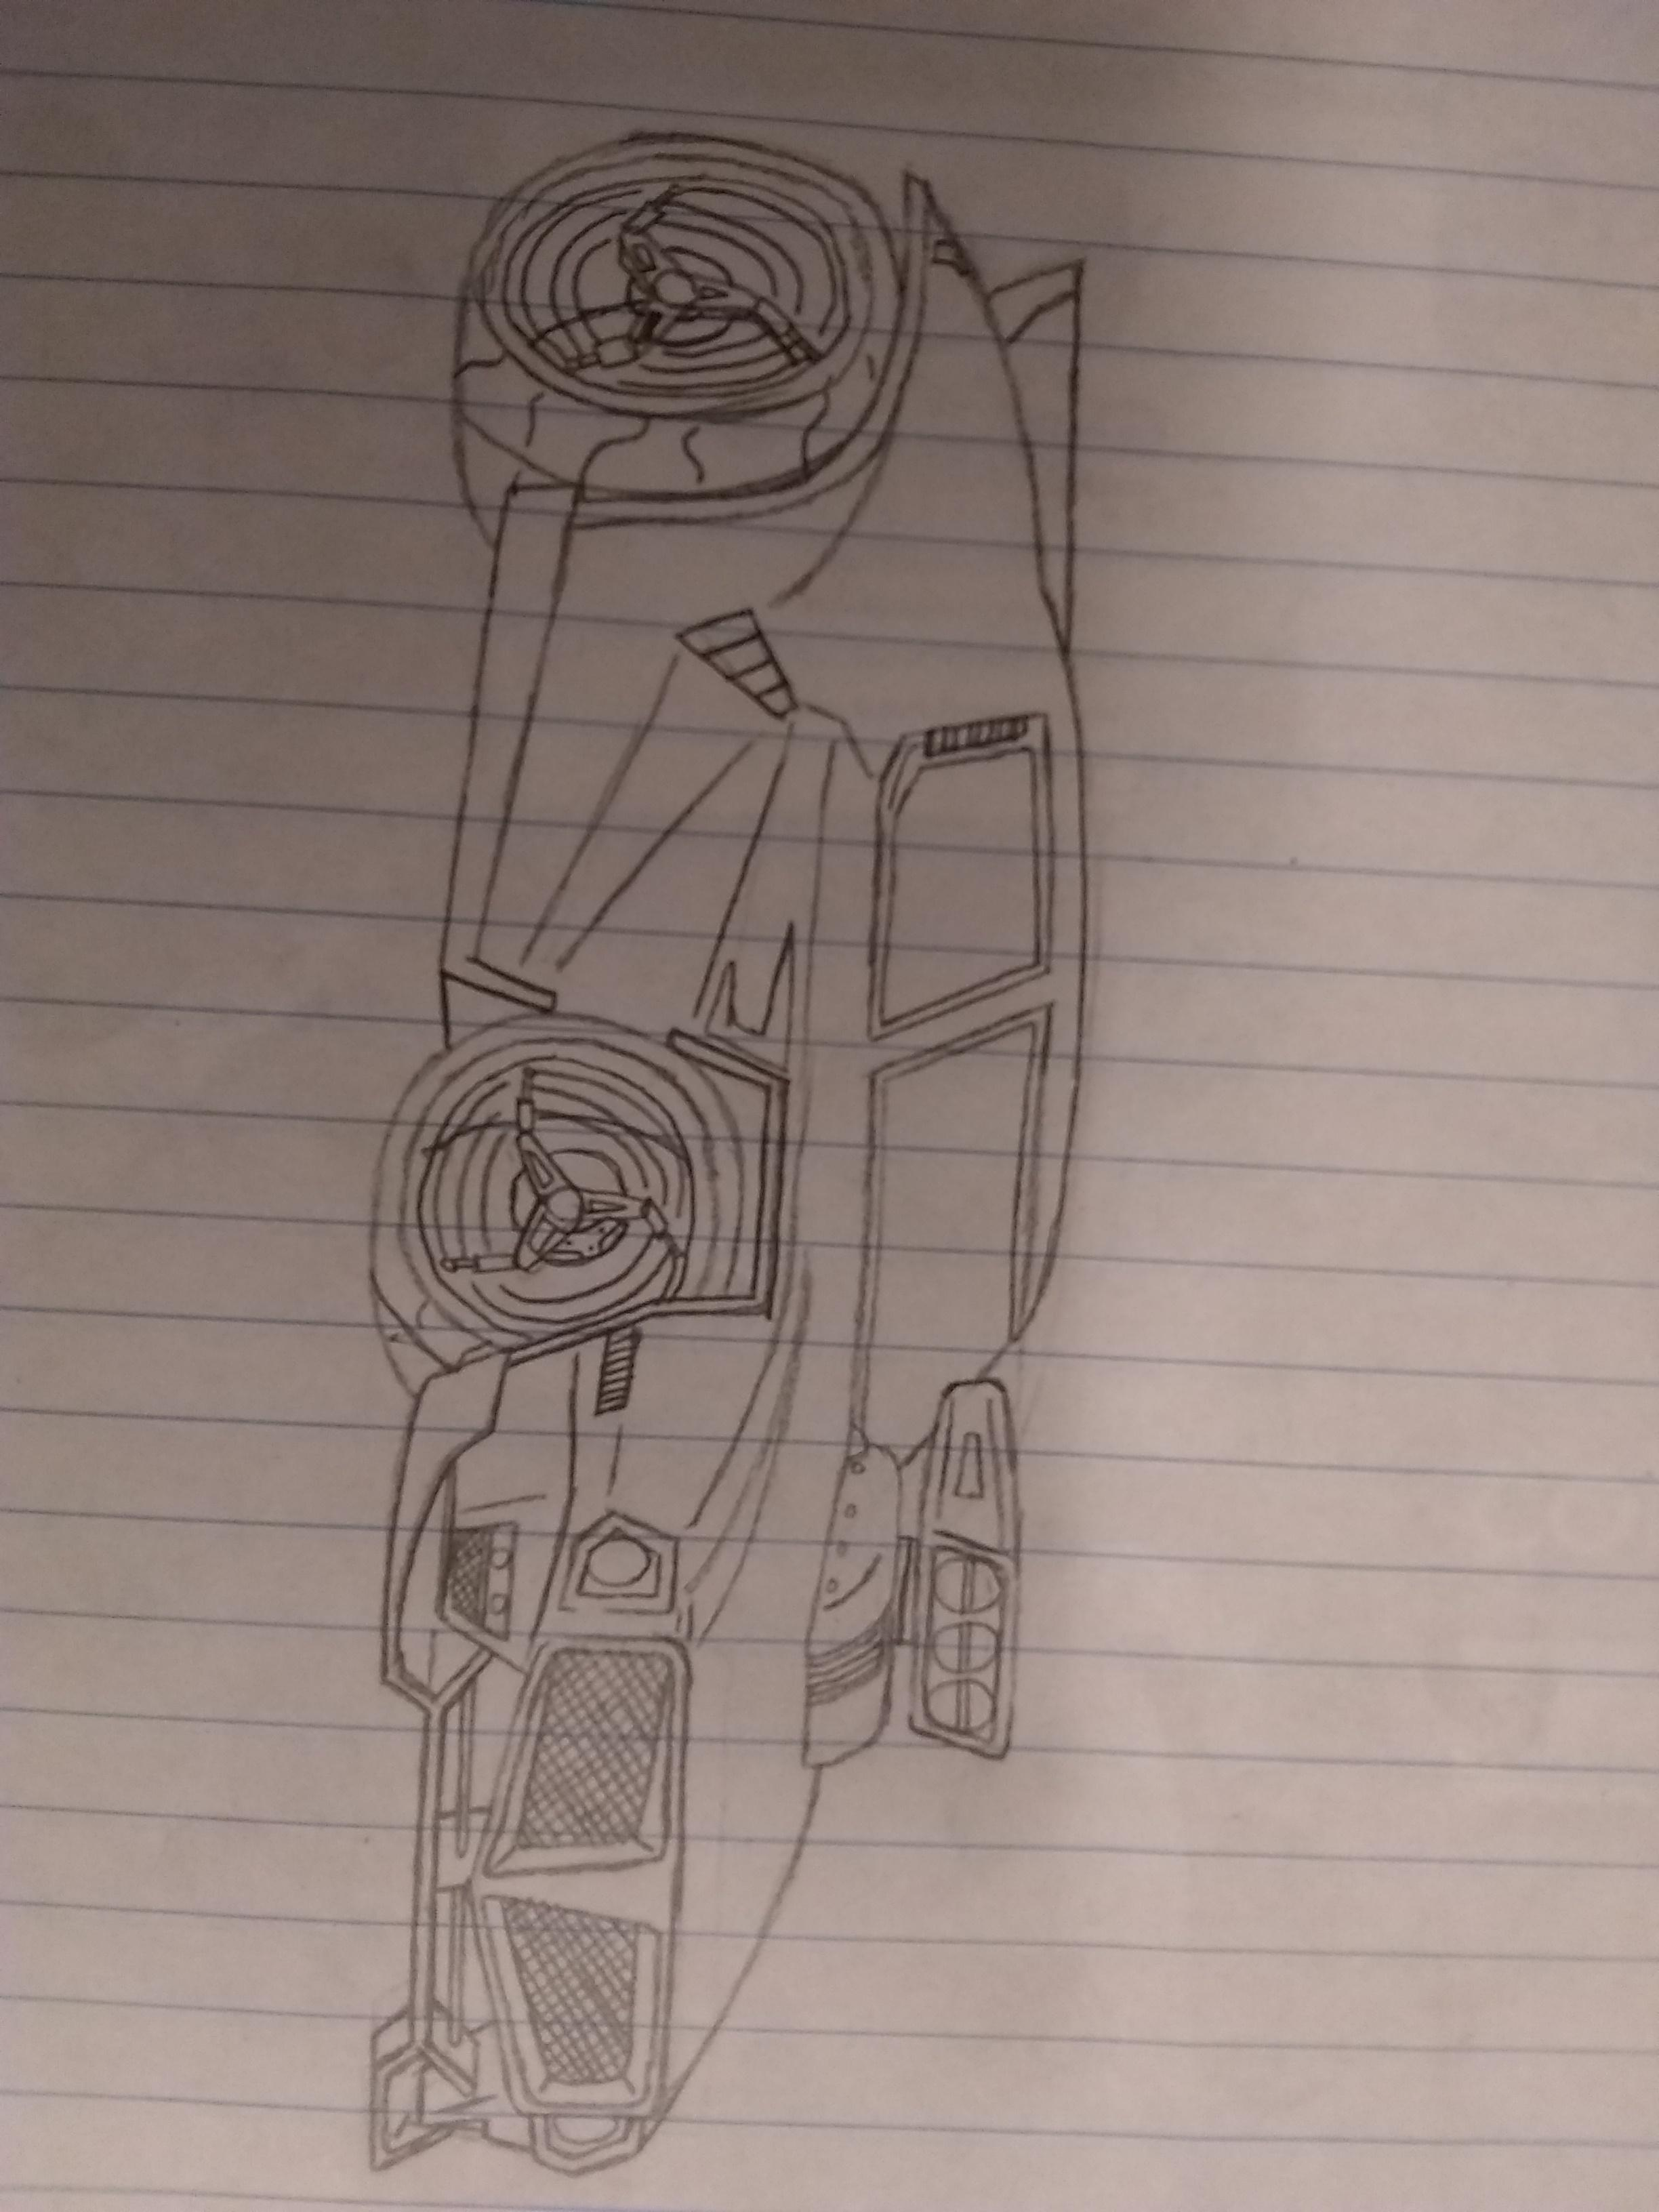 Rocket League Drawing : rocket, league, drawing, Dominus, Drawing, RocketLeague